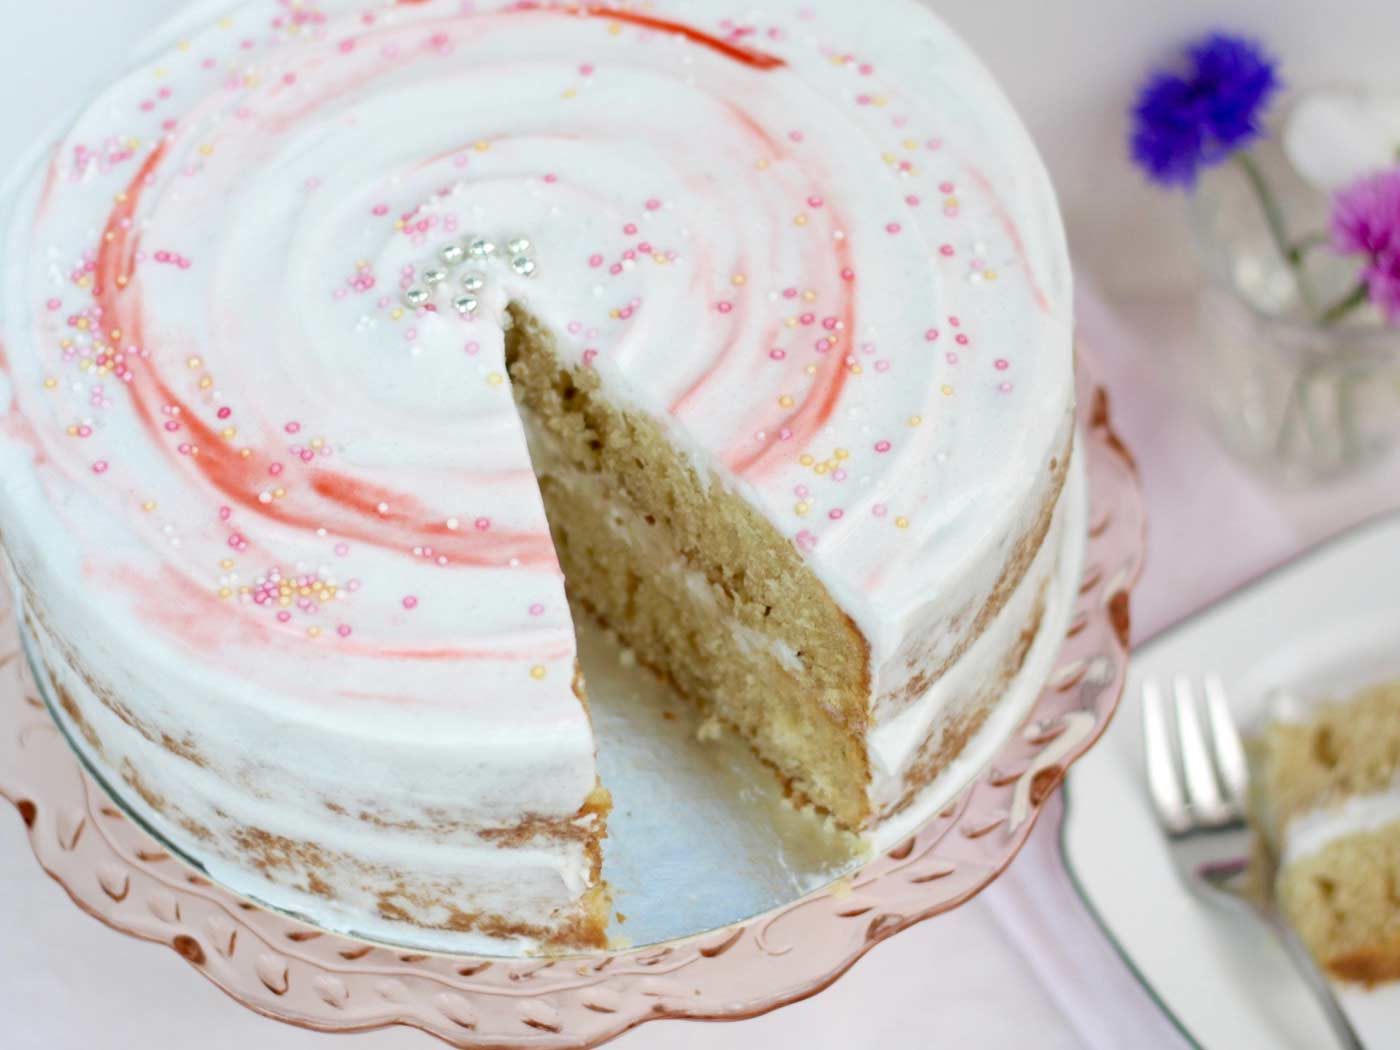 Gluten Free Dairy Free Egg Free Sponge Cake